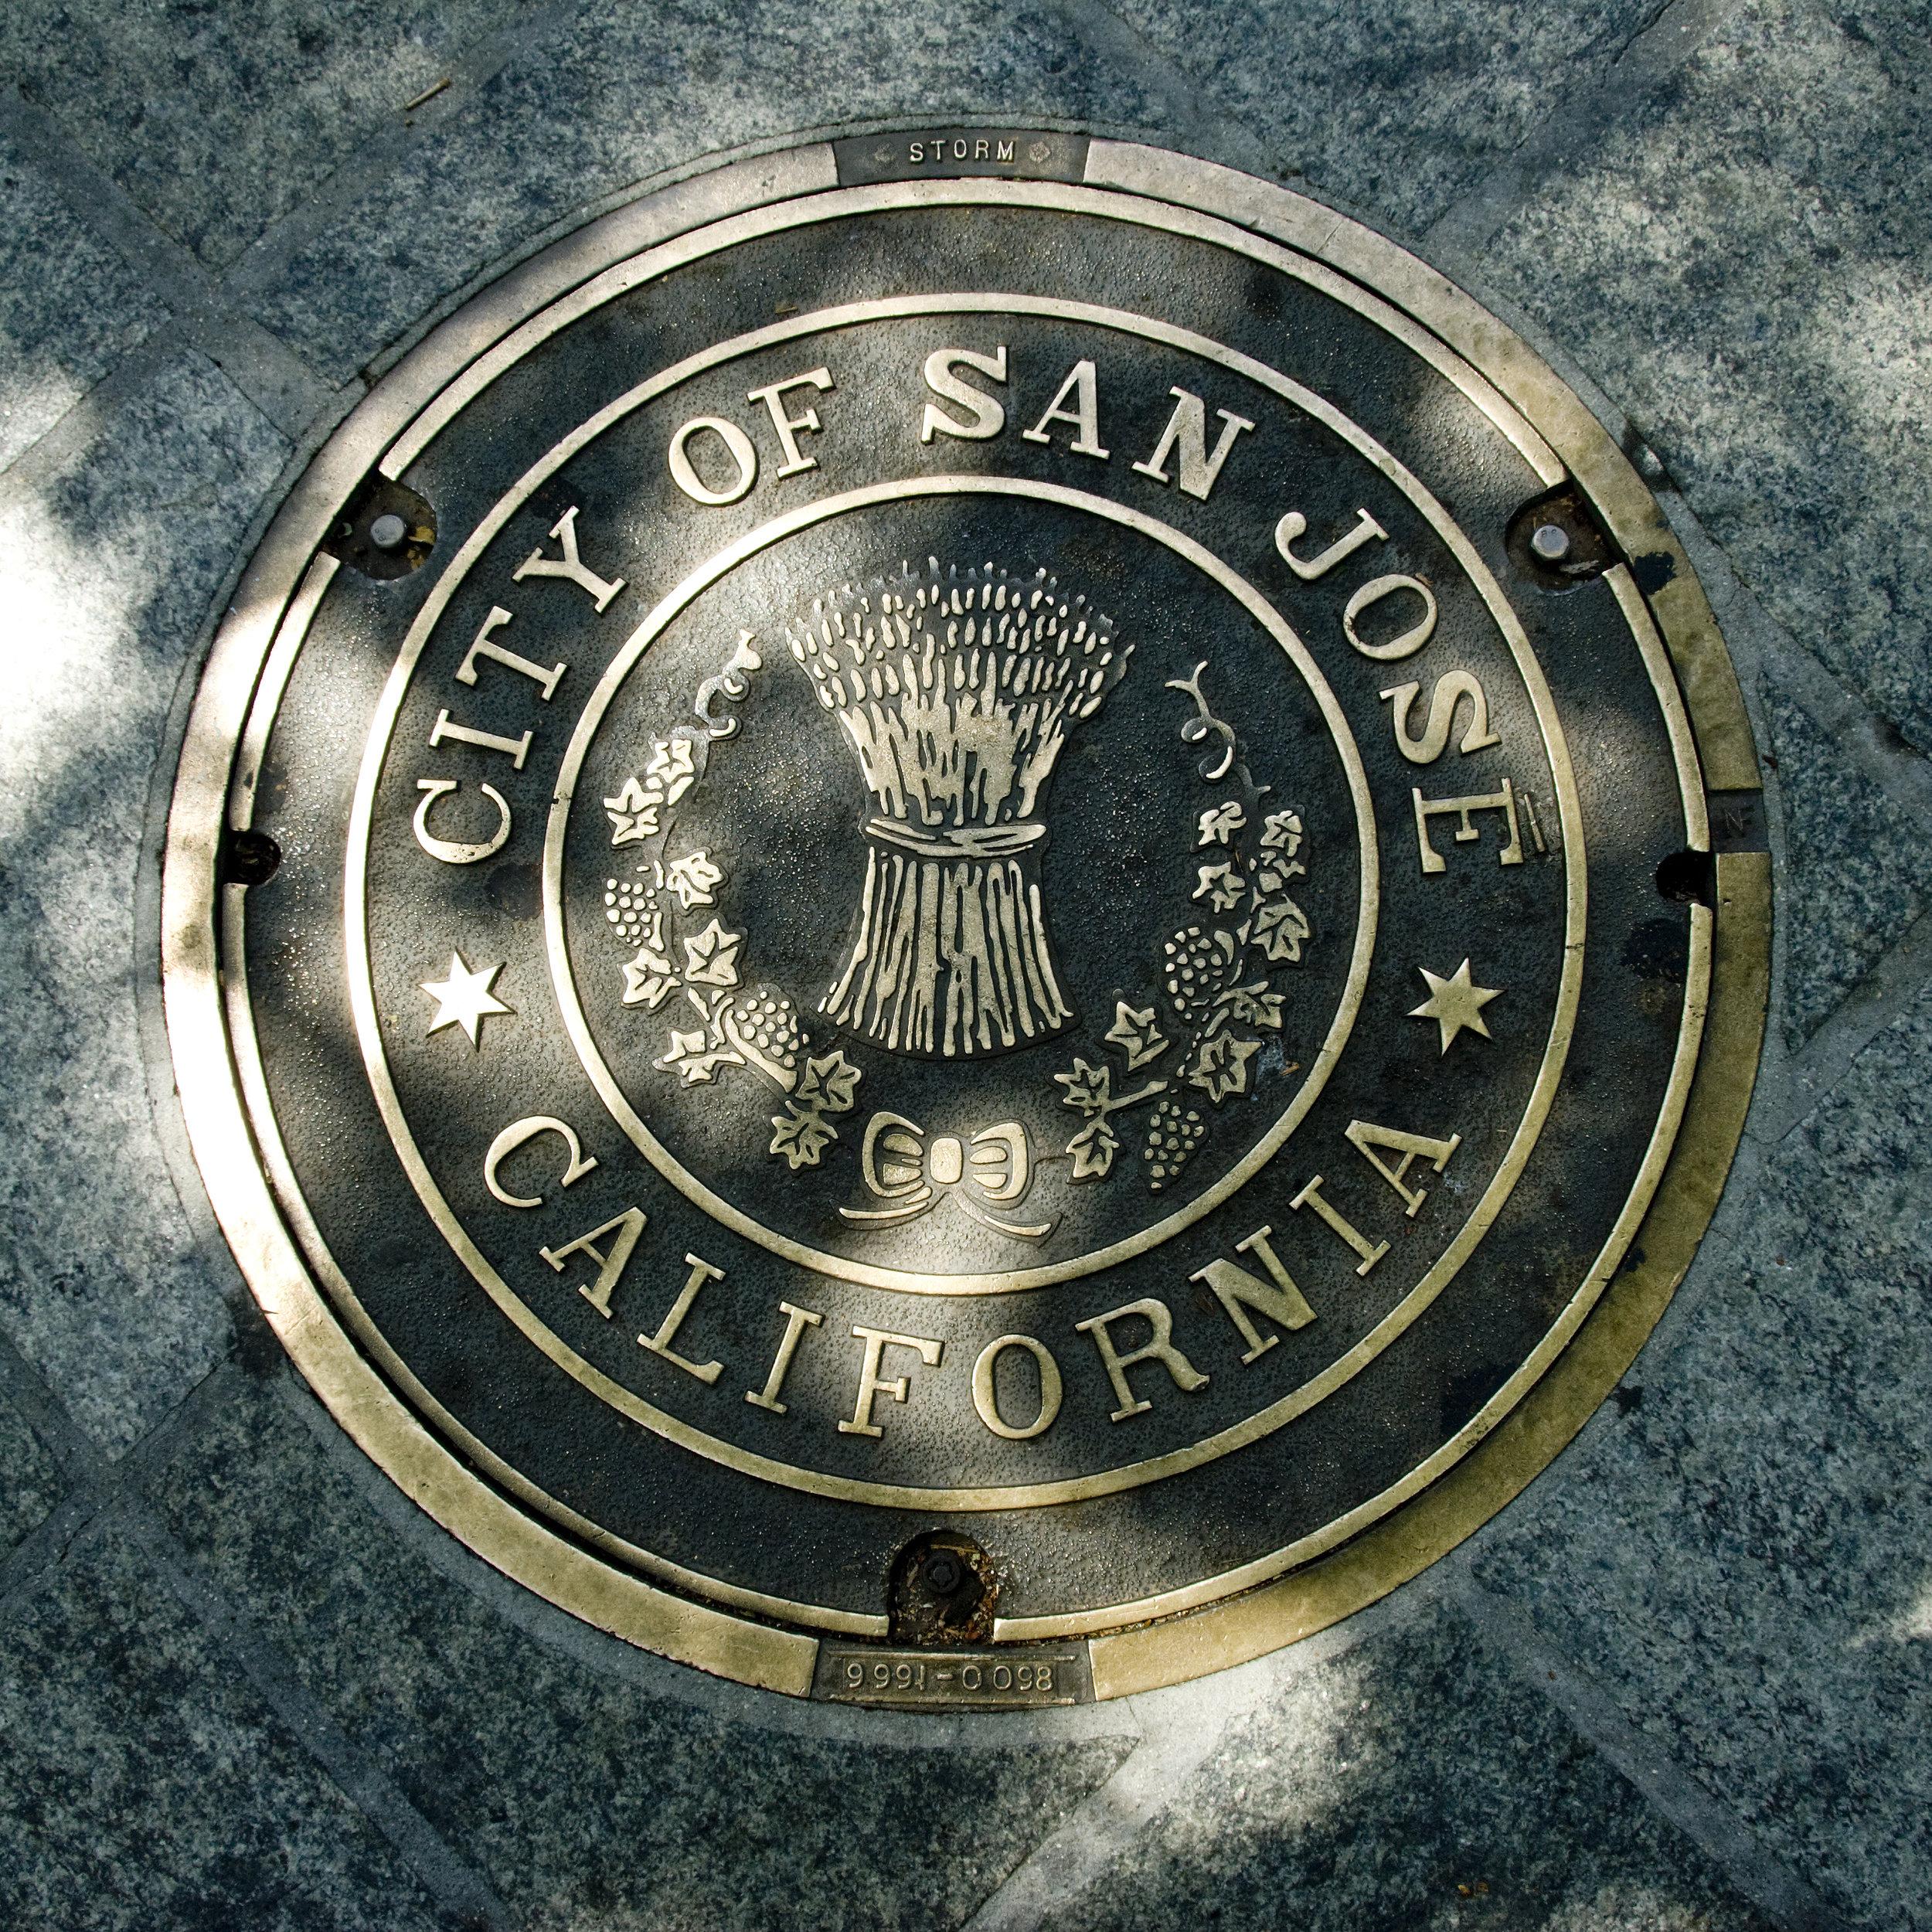 San Jose California  USA